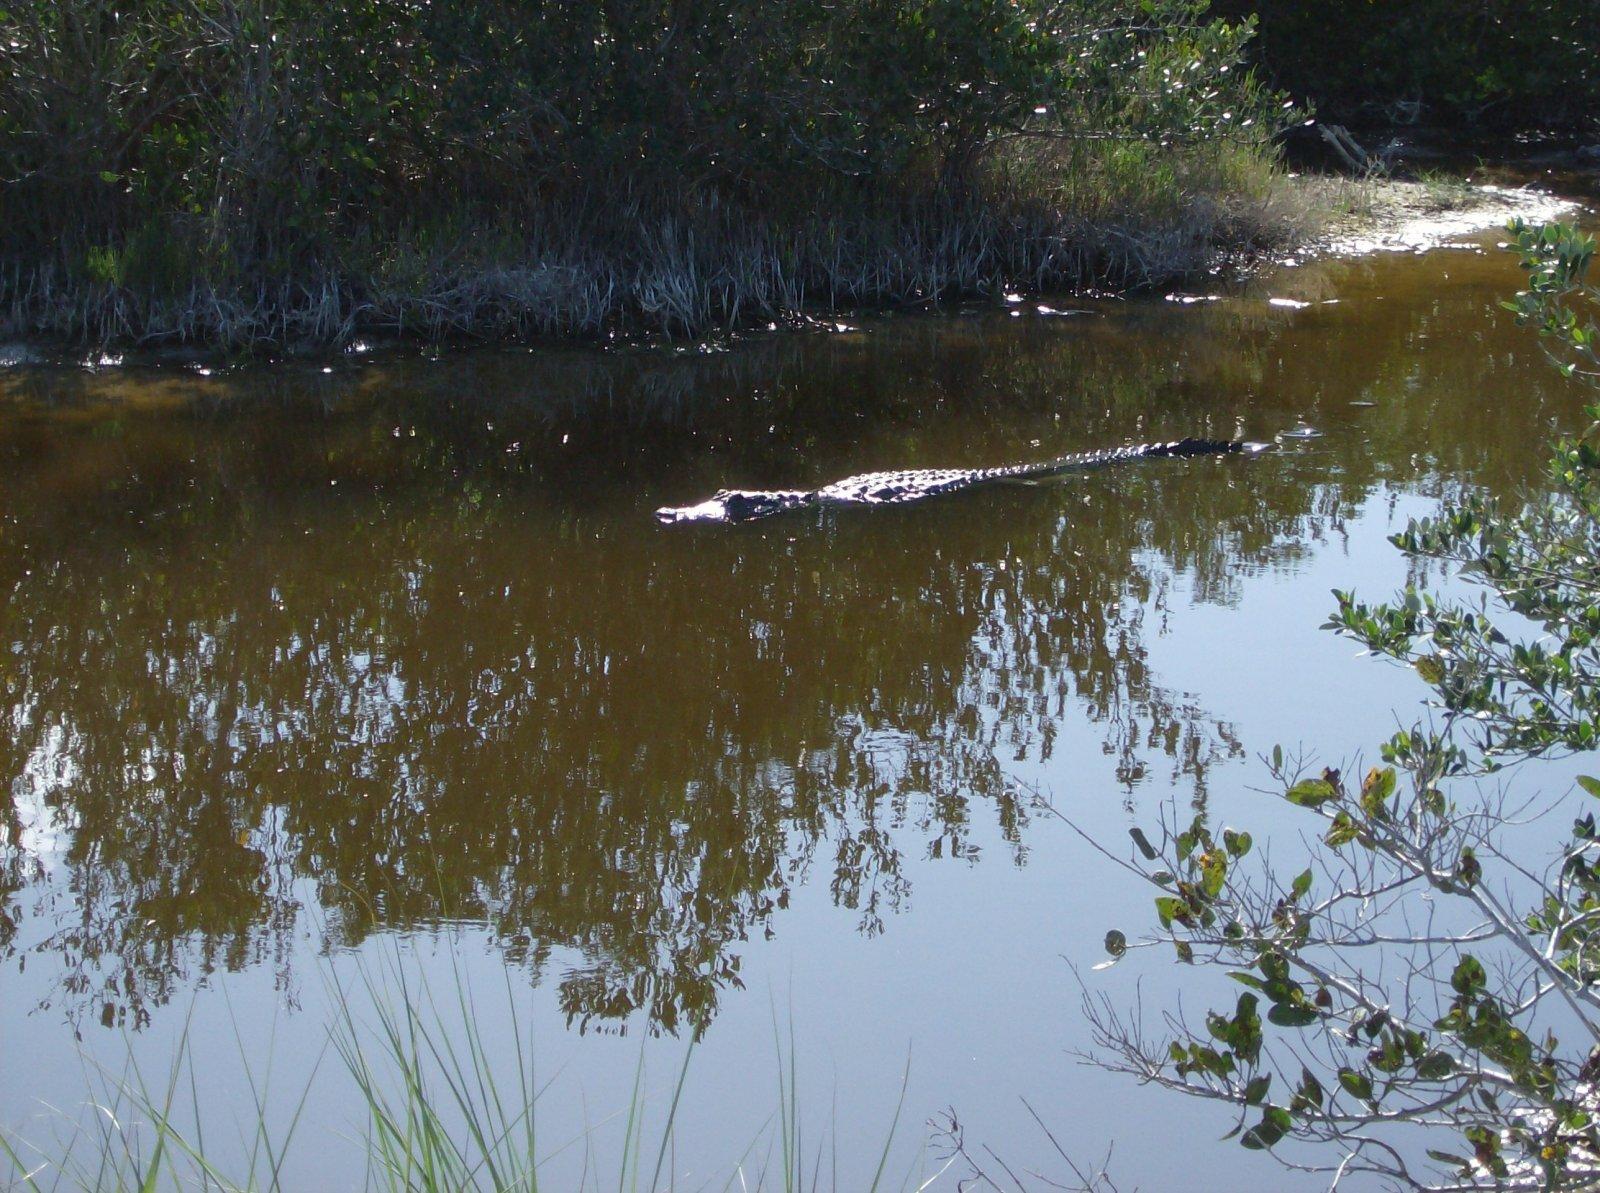 Click image for larger version  Name:Playalina Beach & Florida Gators 004.jpg Views:88 Size:398.5 KB ID:153347